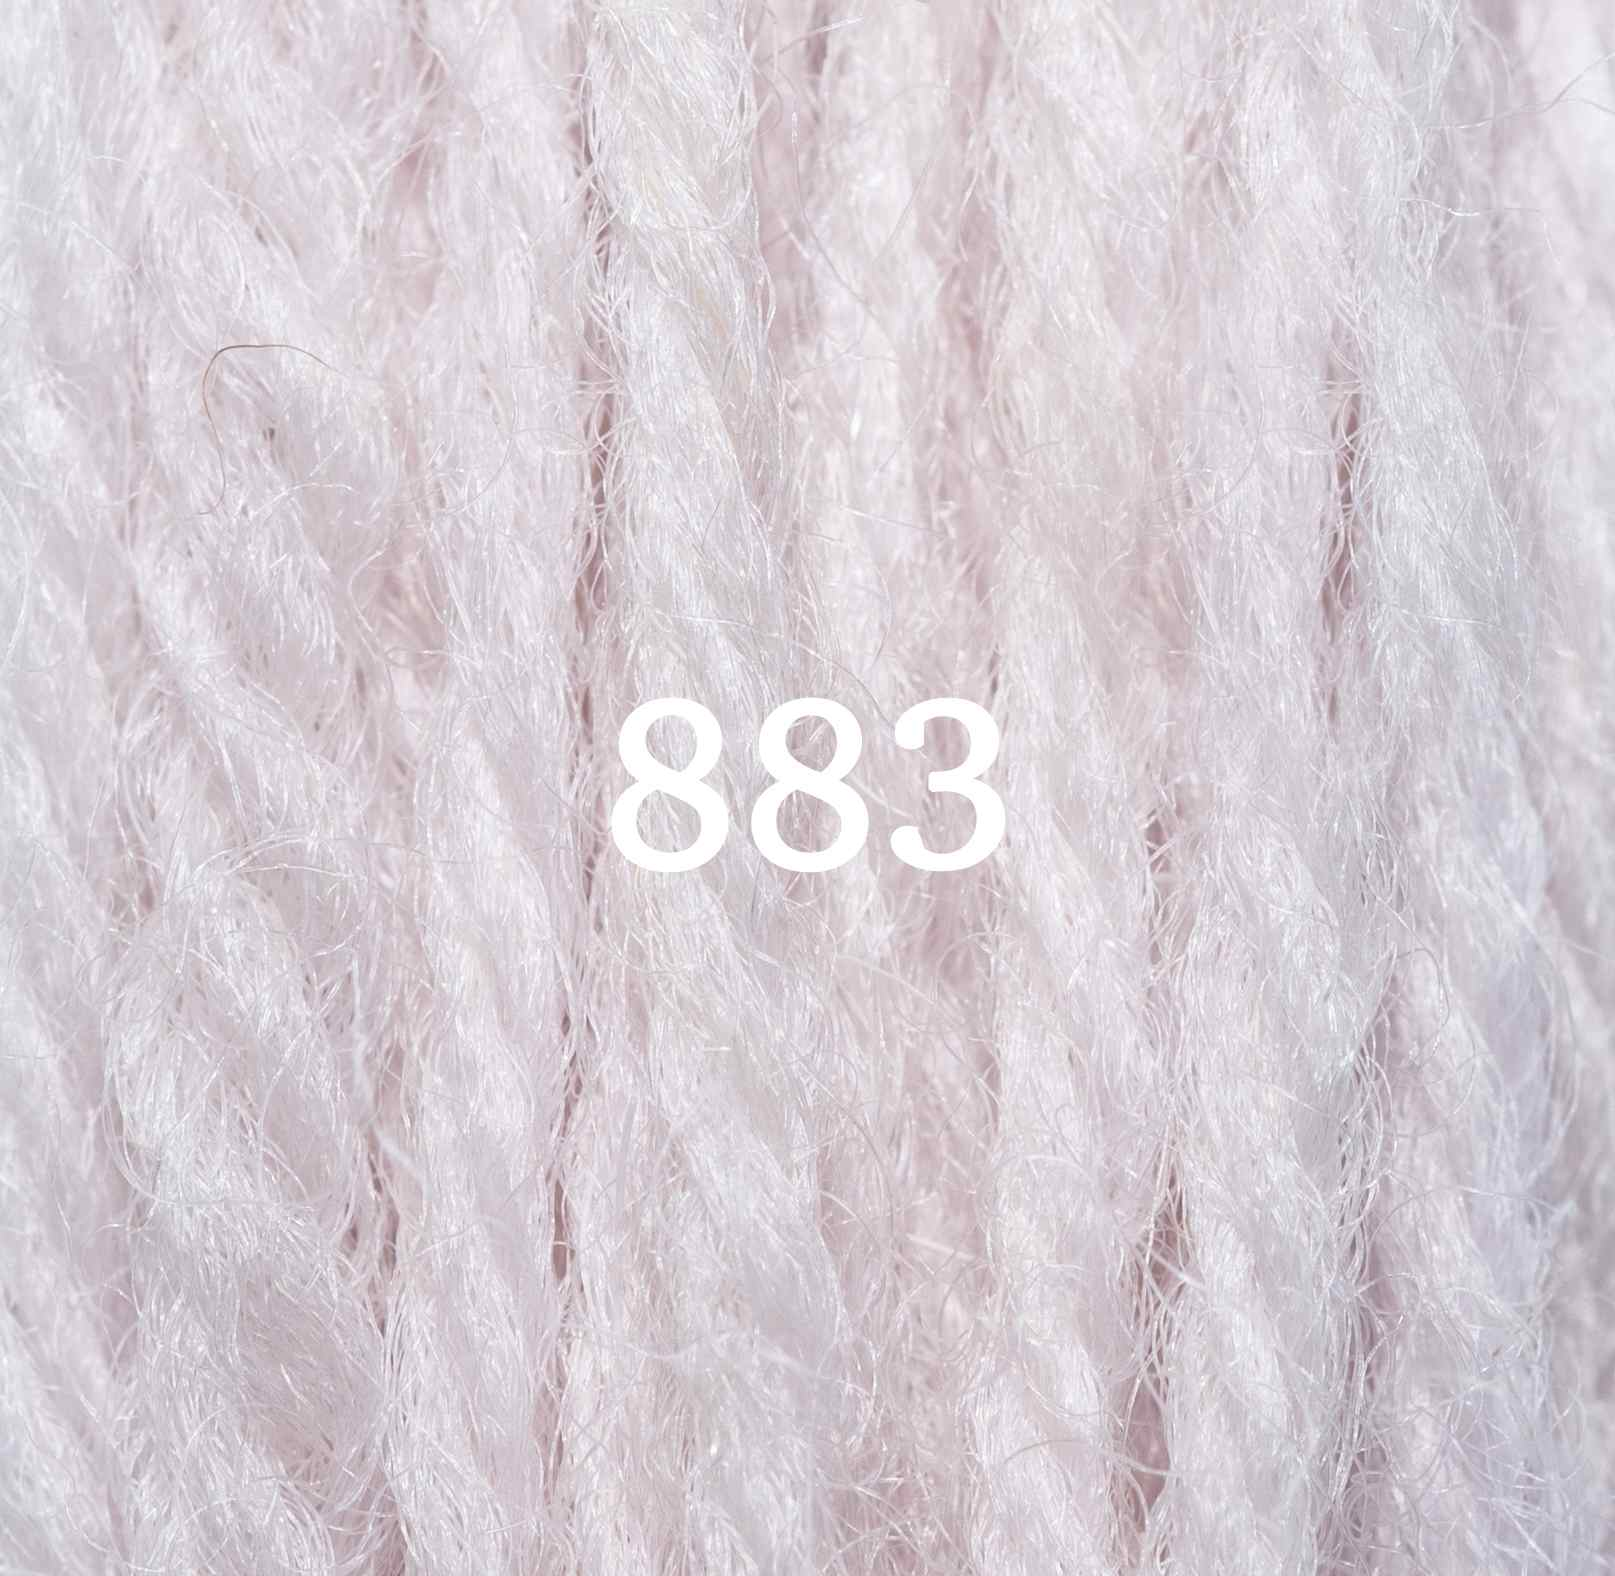 Pastel-Shades-2-883